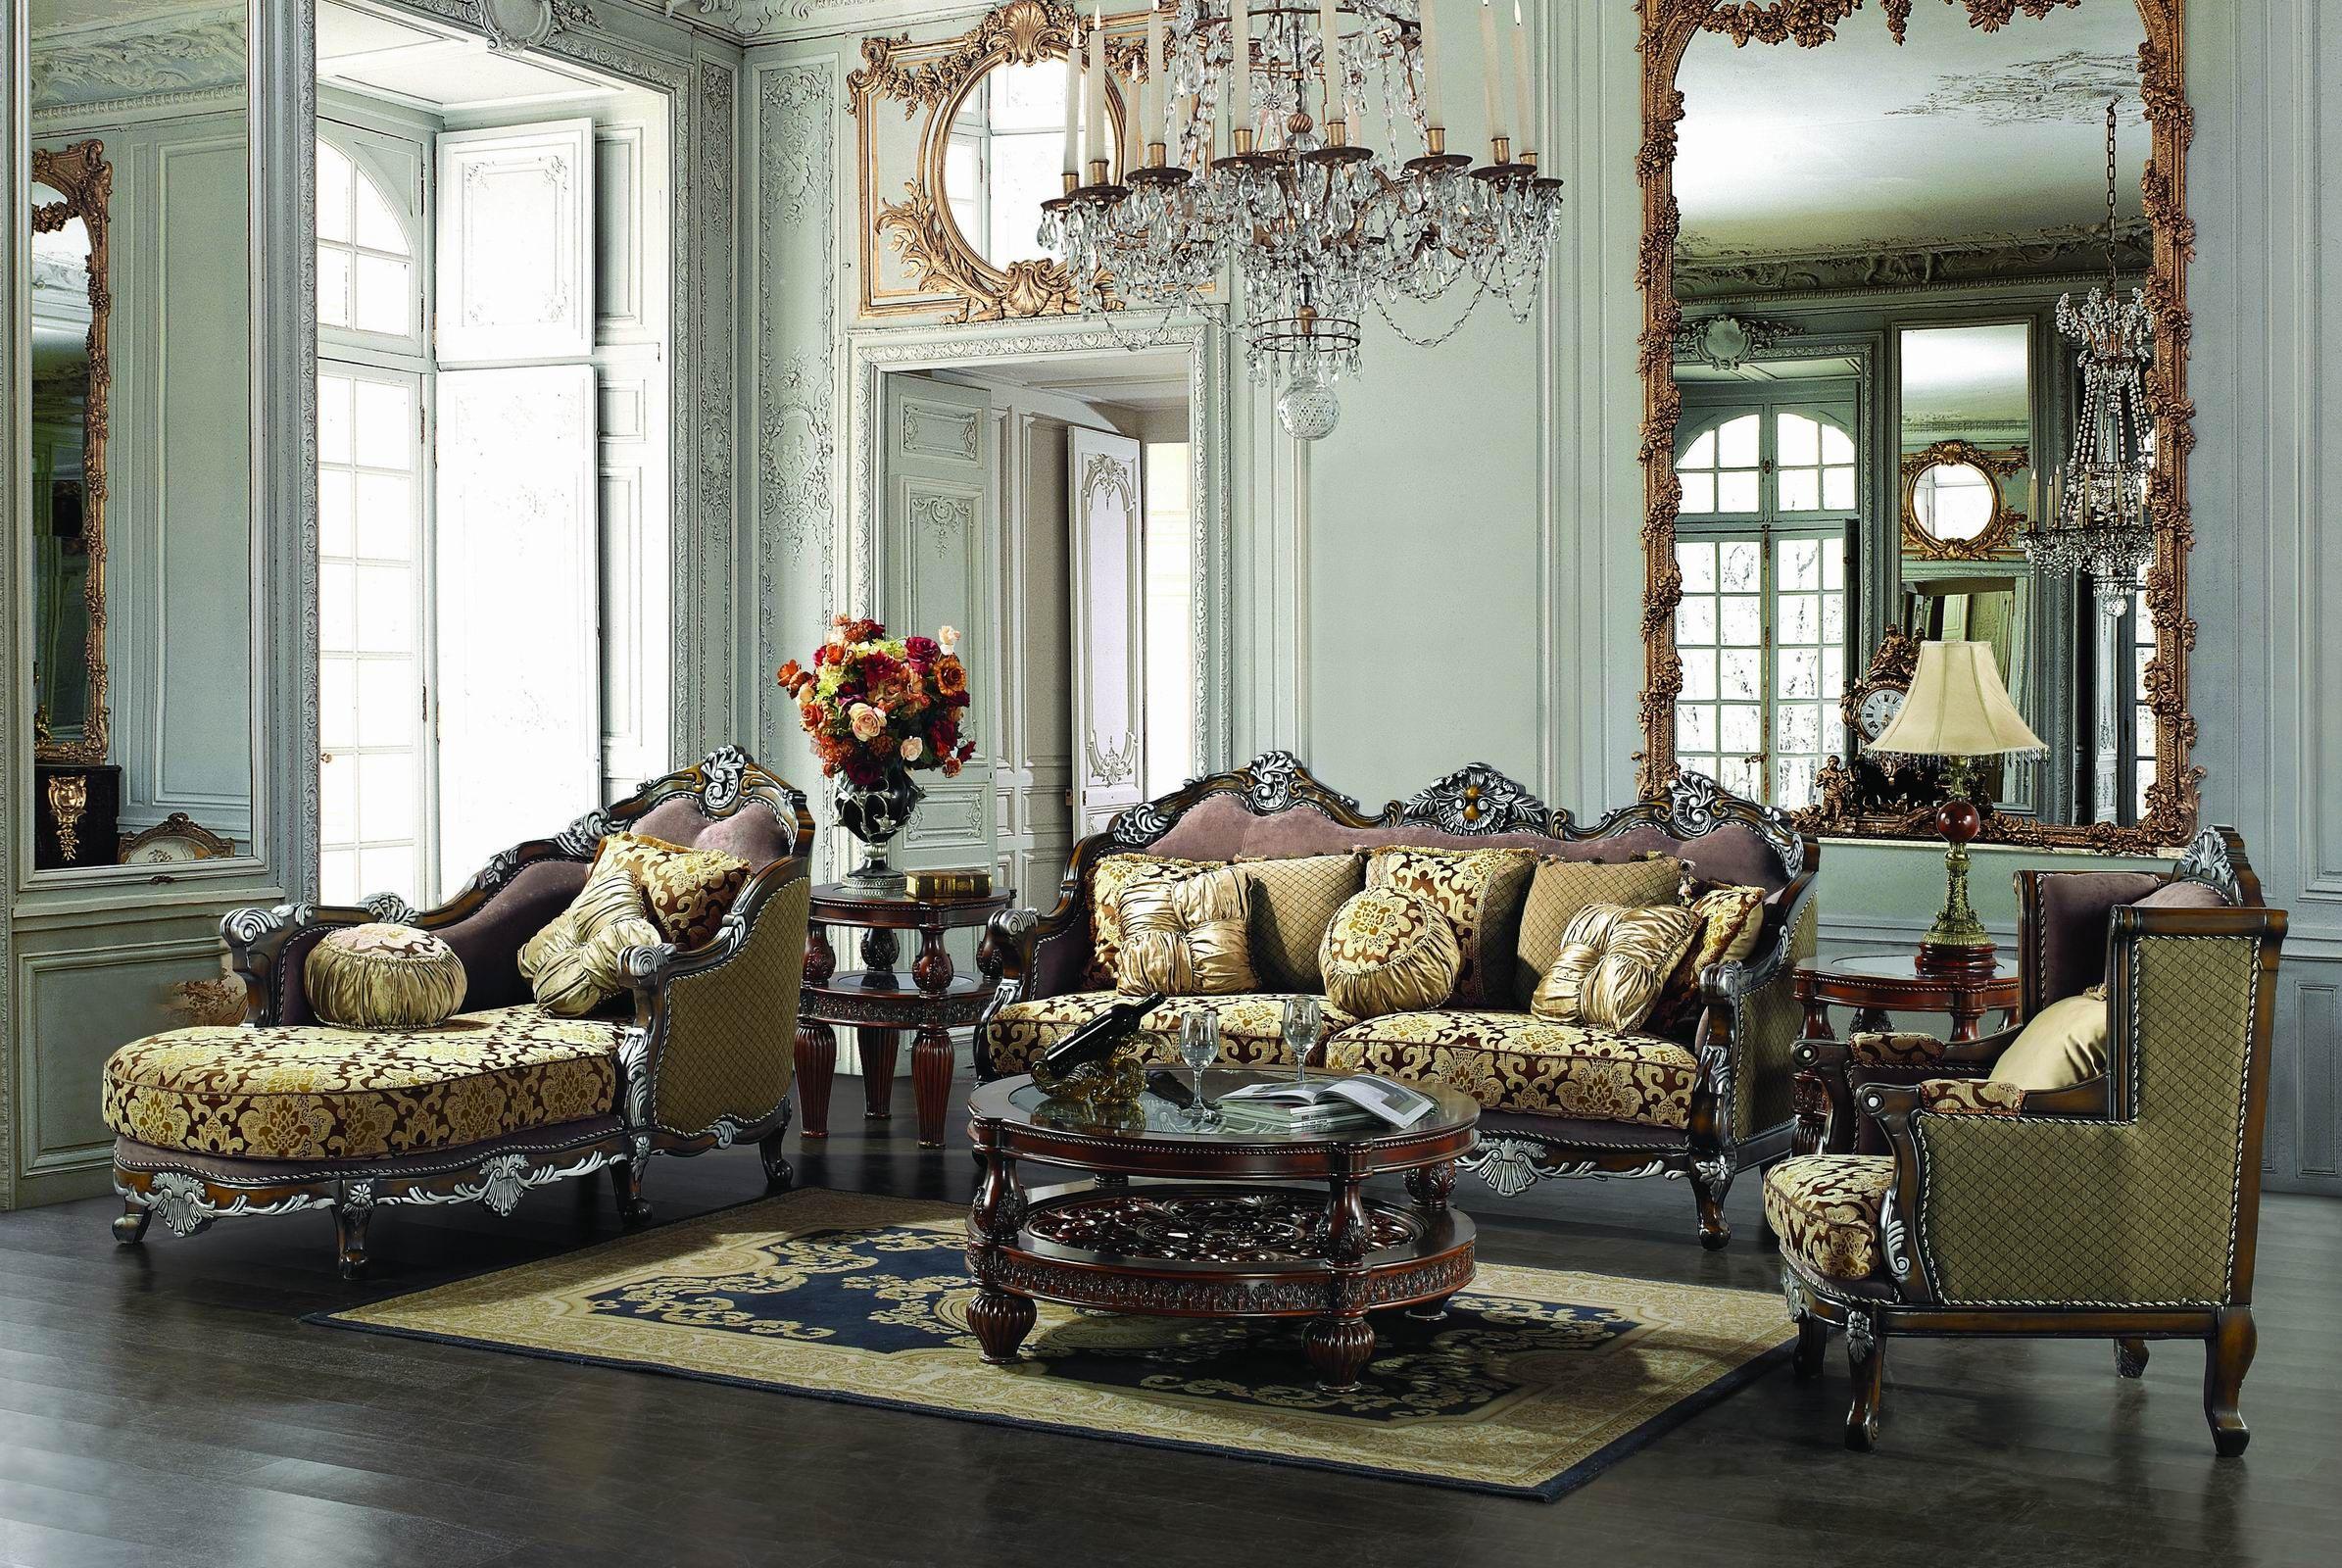 Pin by Supernova Furniture on SuperNova Living Rooms   Living room sets furniture, Formal living ...